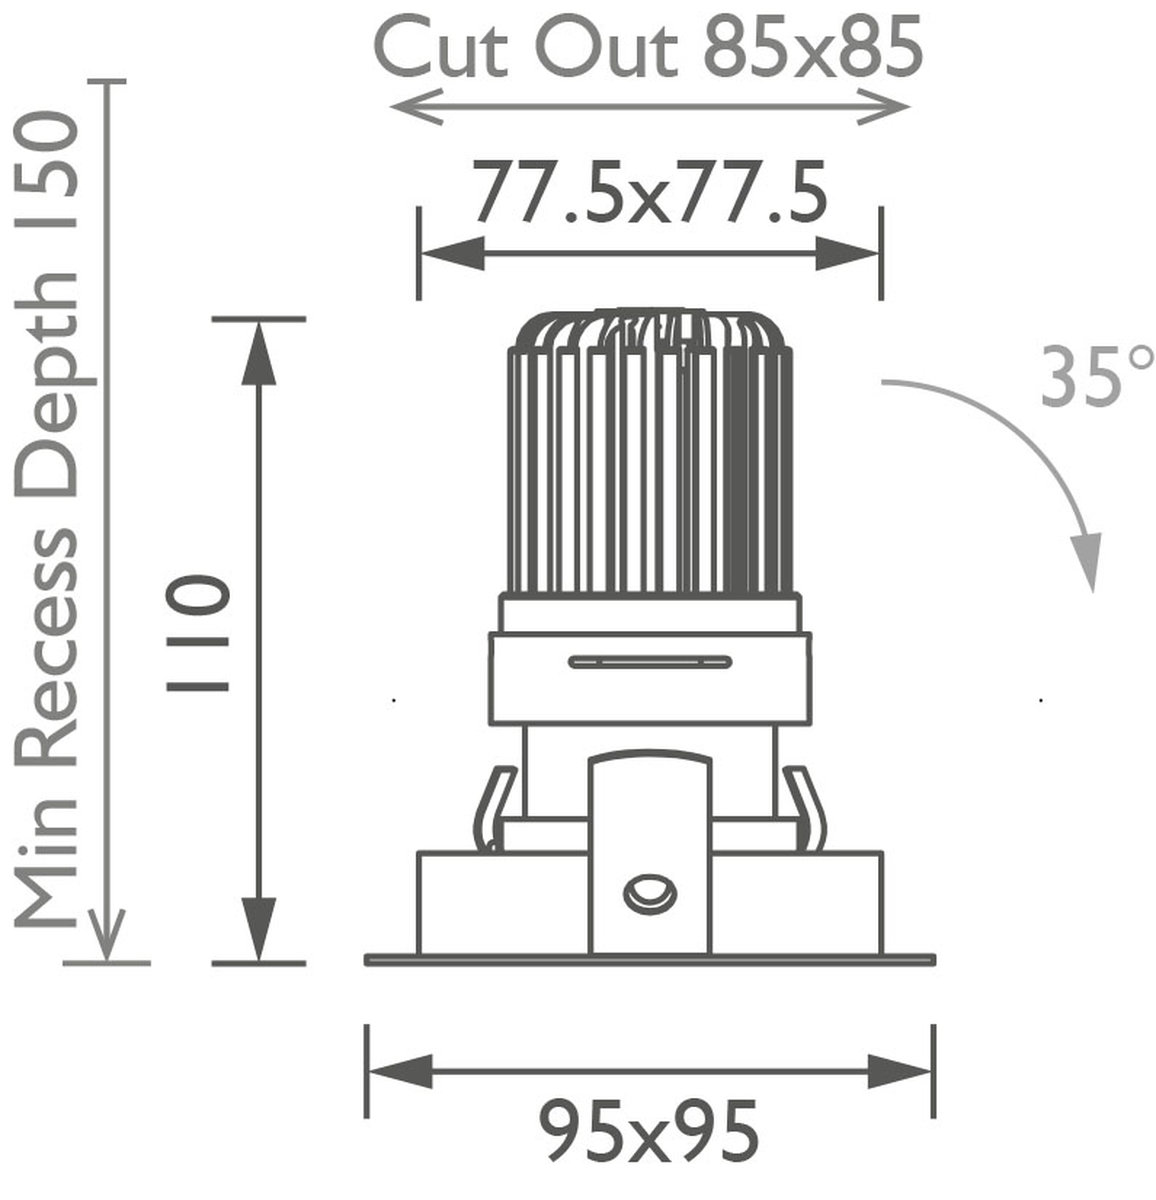 Square 50+ Trim IP Downlight technical image